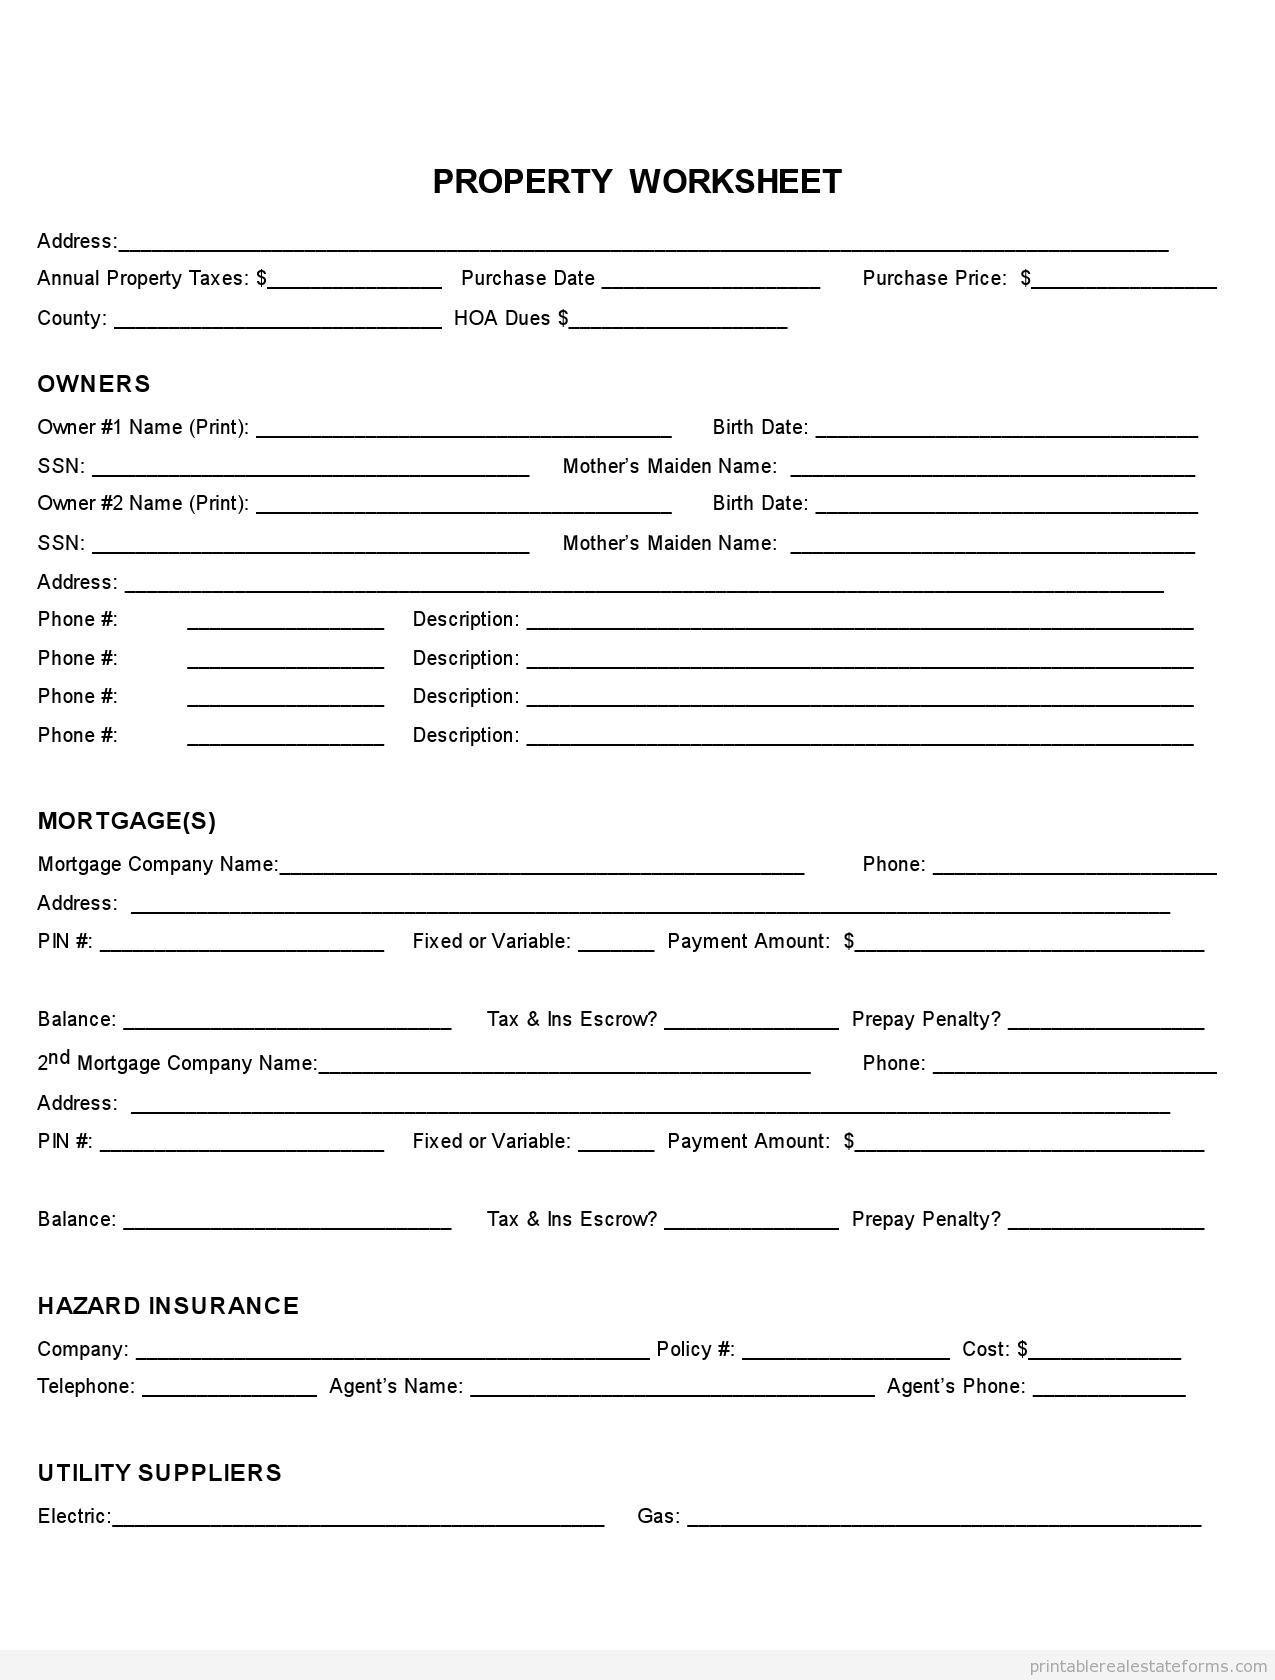 Sample Printable Property Fact Sheet Form